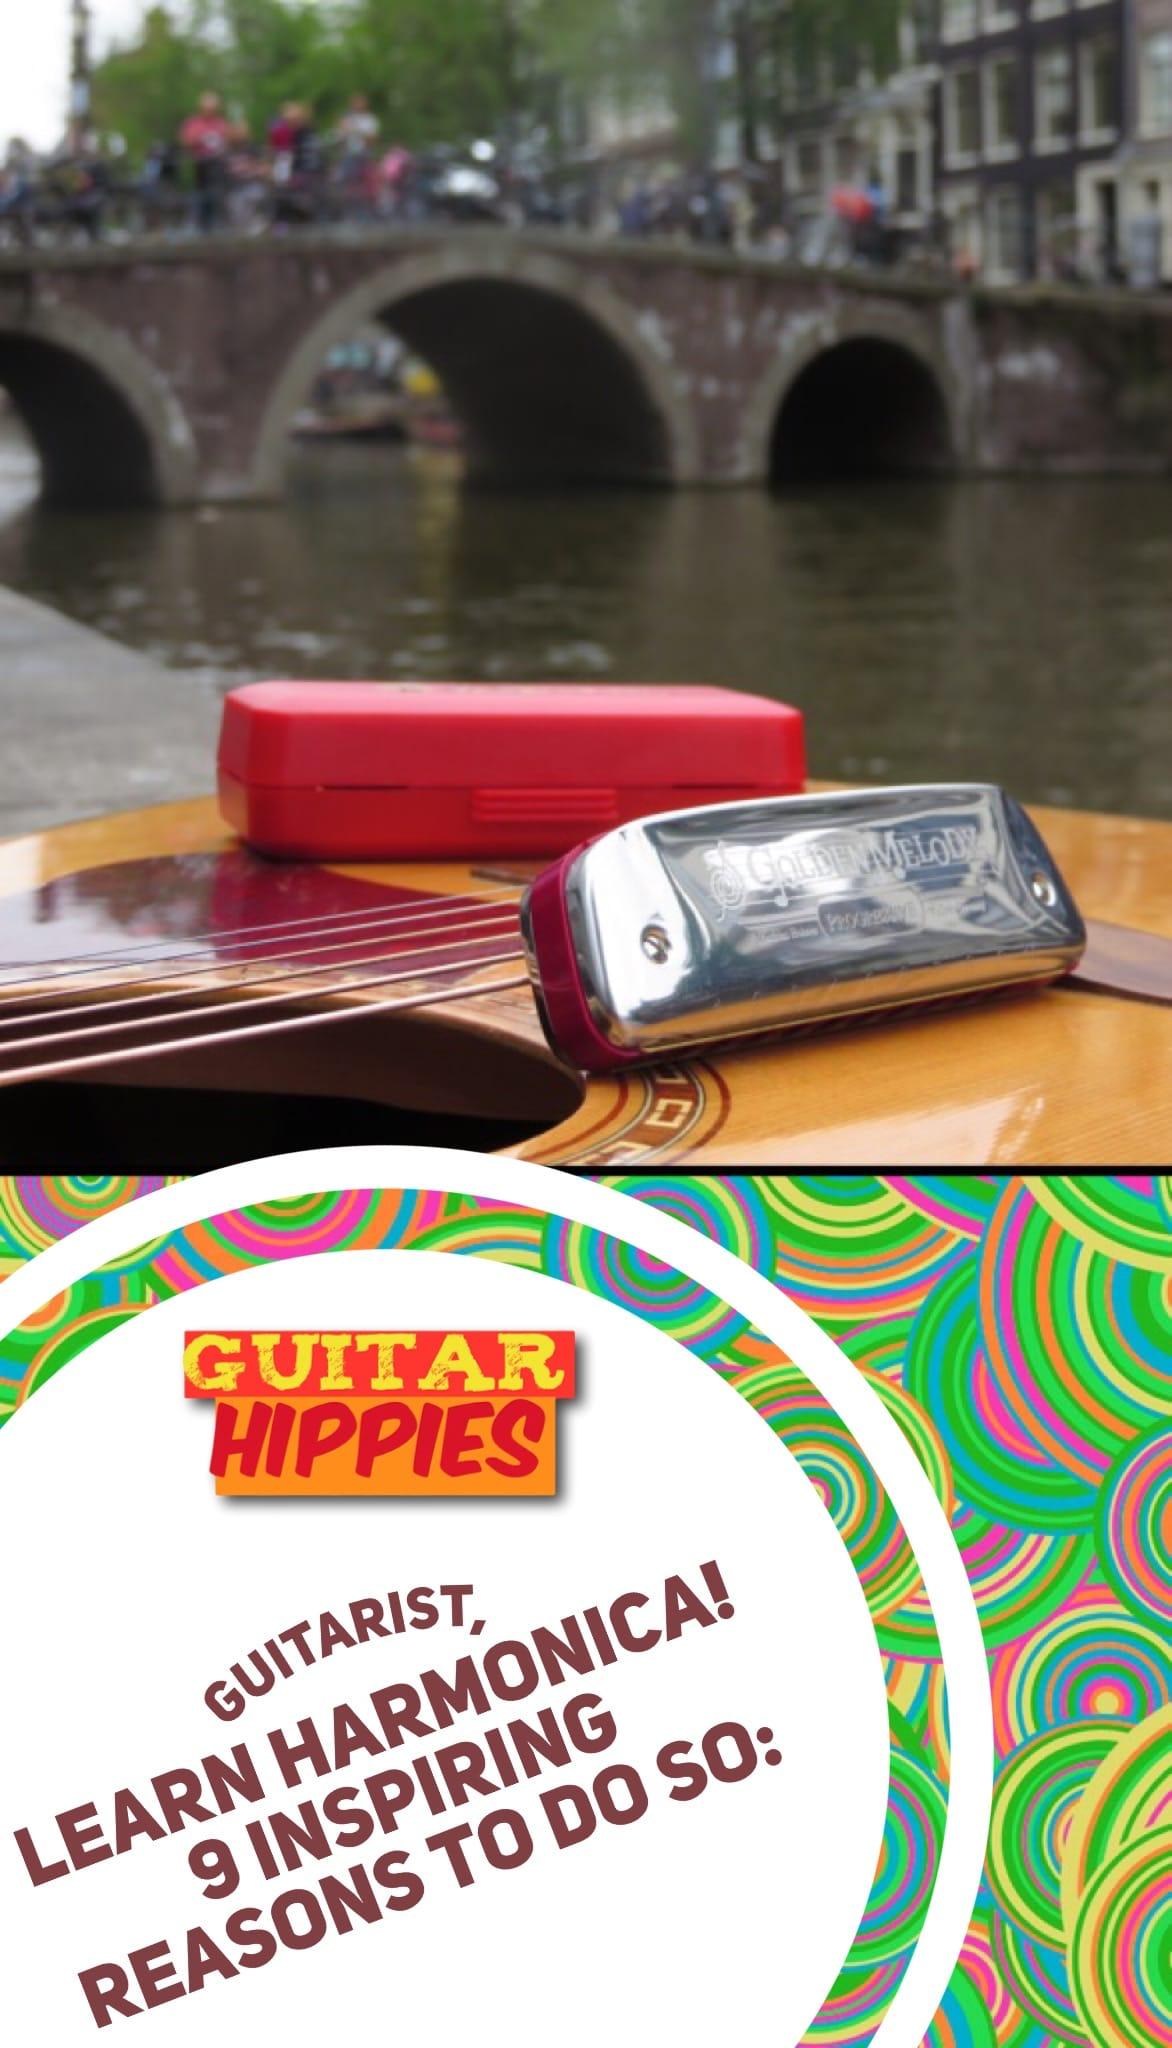 Guitarist? Learn Harmonica! 9 Inspiring Reasons To Do So